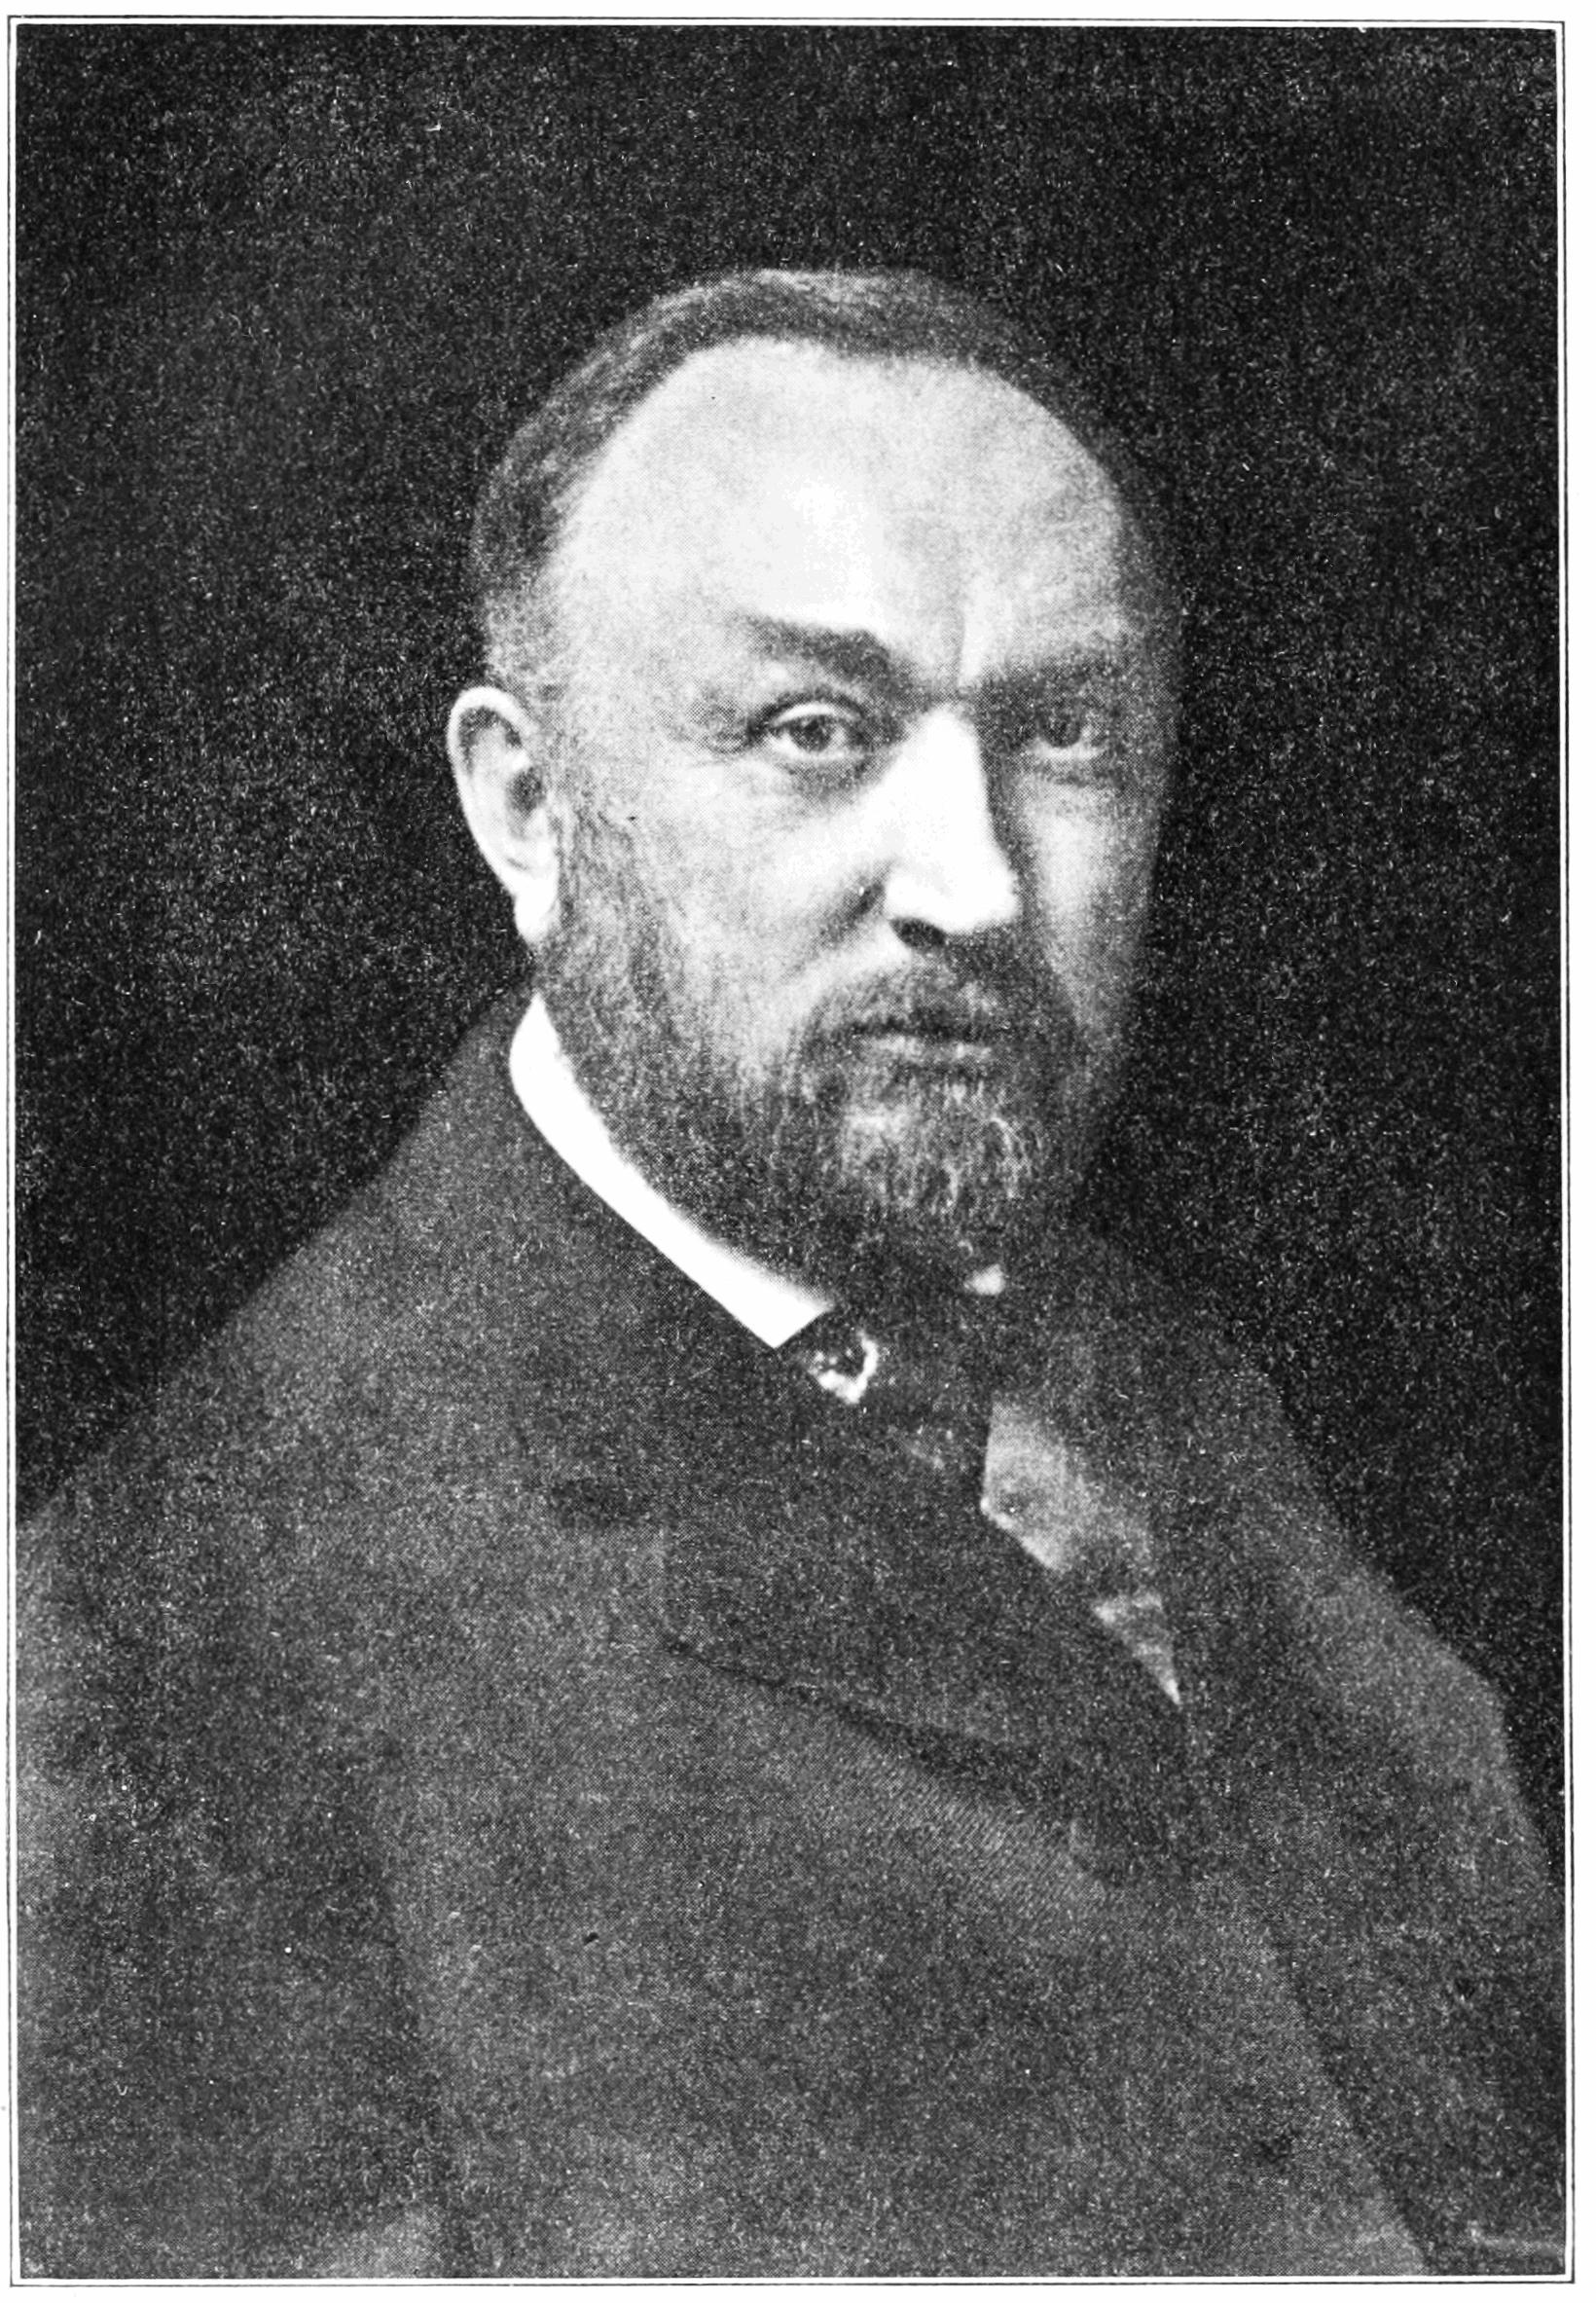 Works of Edward Charles Pickering